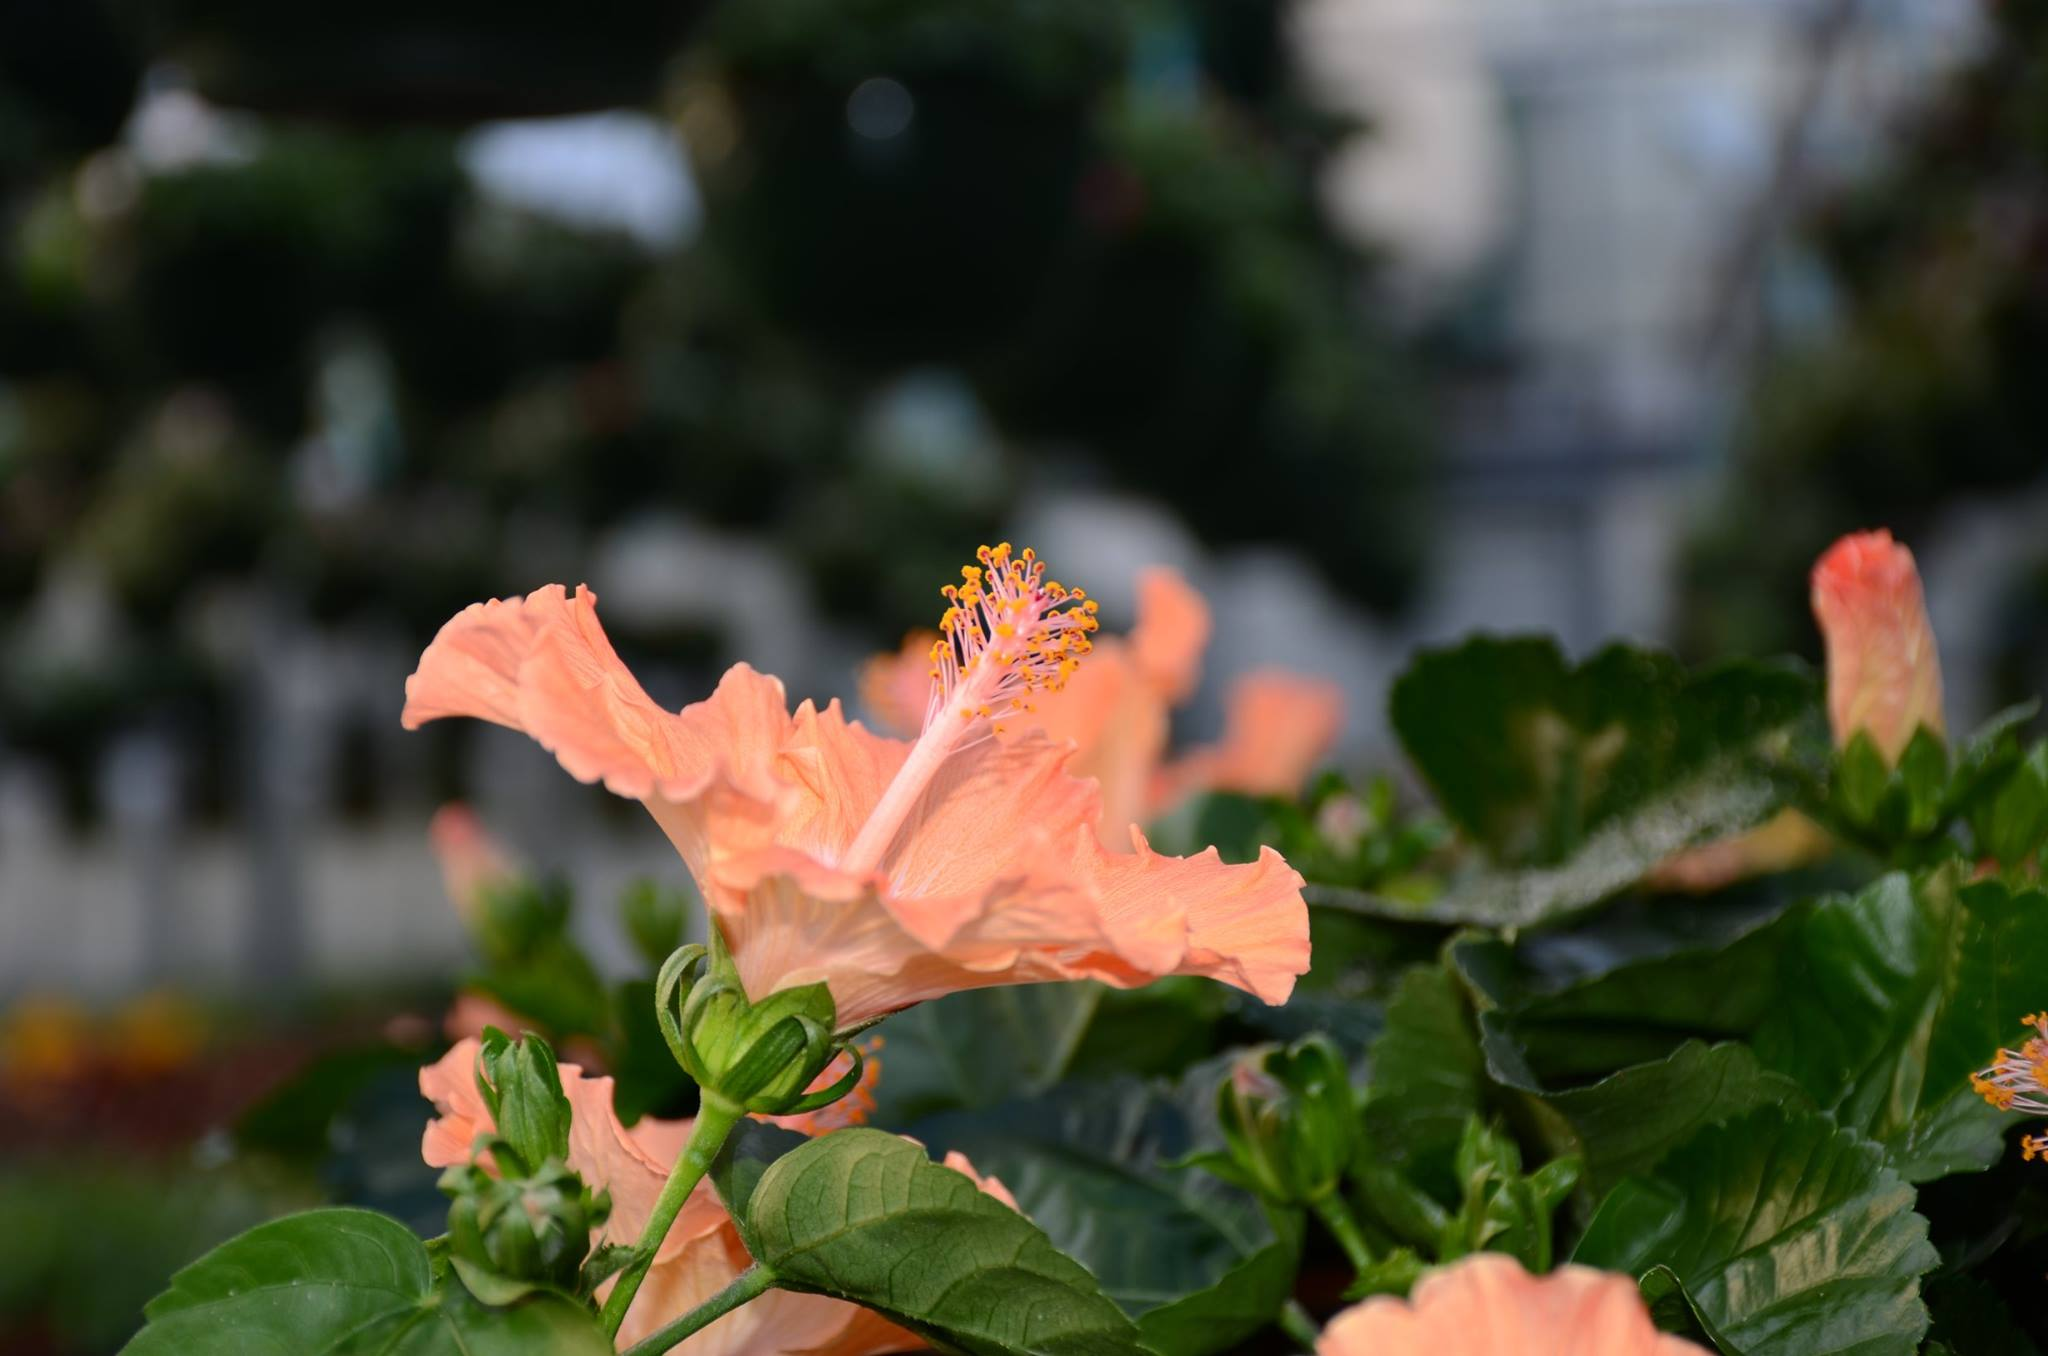 Greenhouse Flowers In Bloom